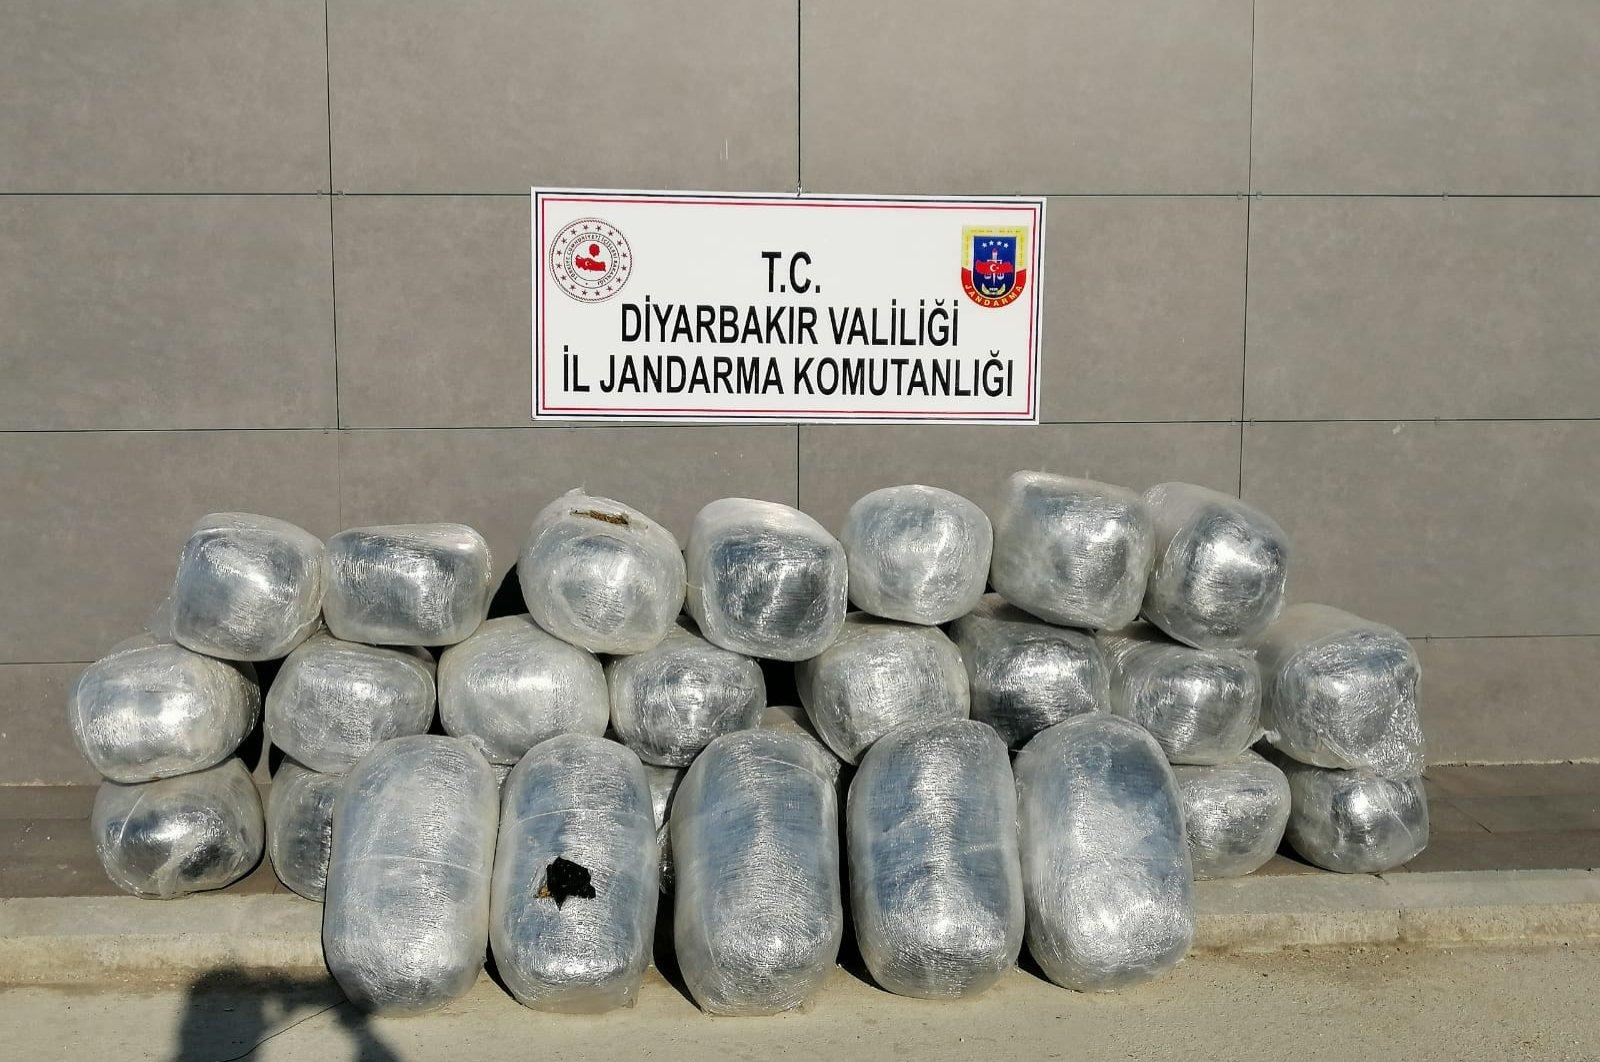 Seized marijuana on display at gendarme command headquarters in Diyarbakır, Turkey, Tuesday, April 14, 2020. (AA Photo)